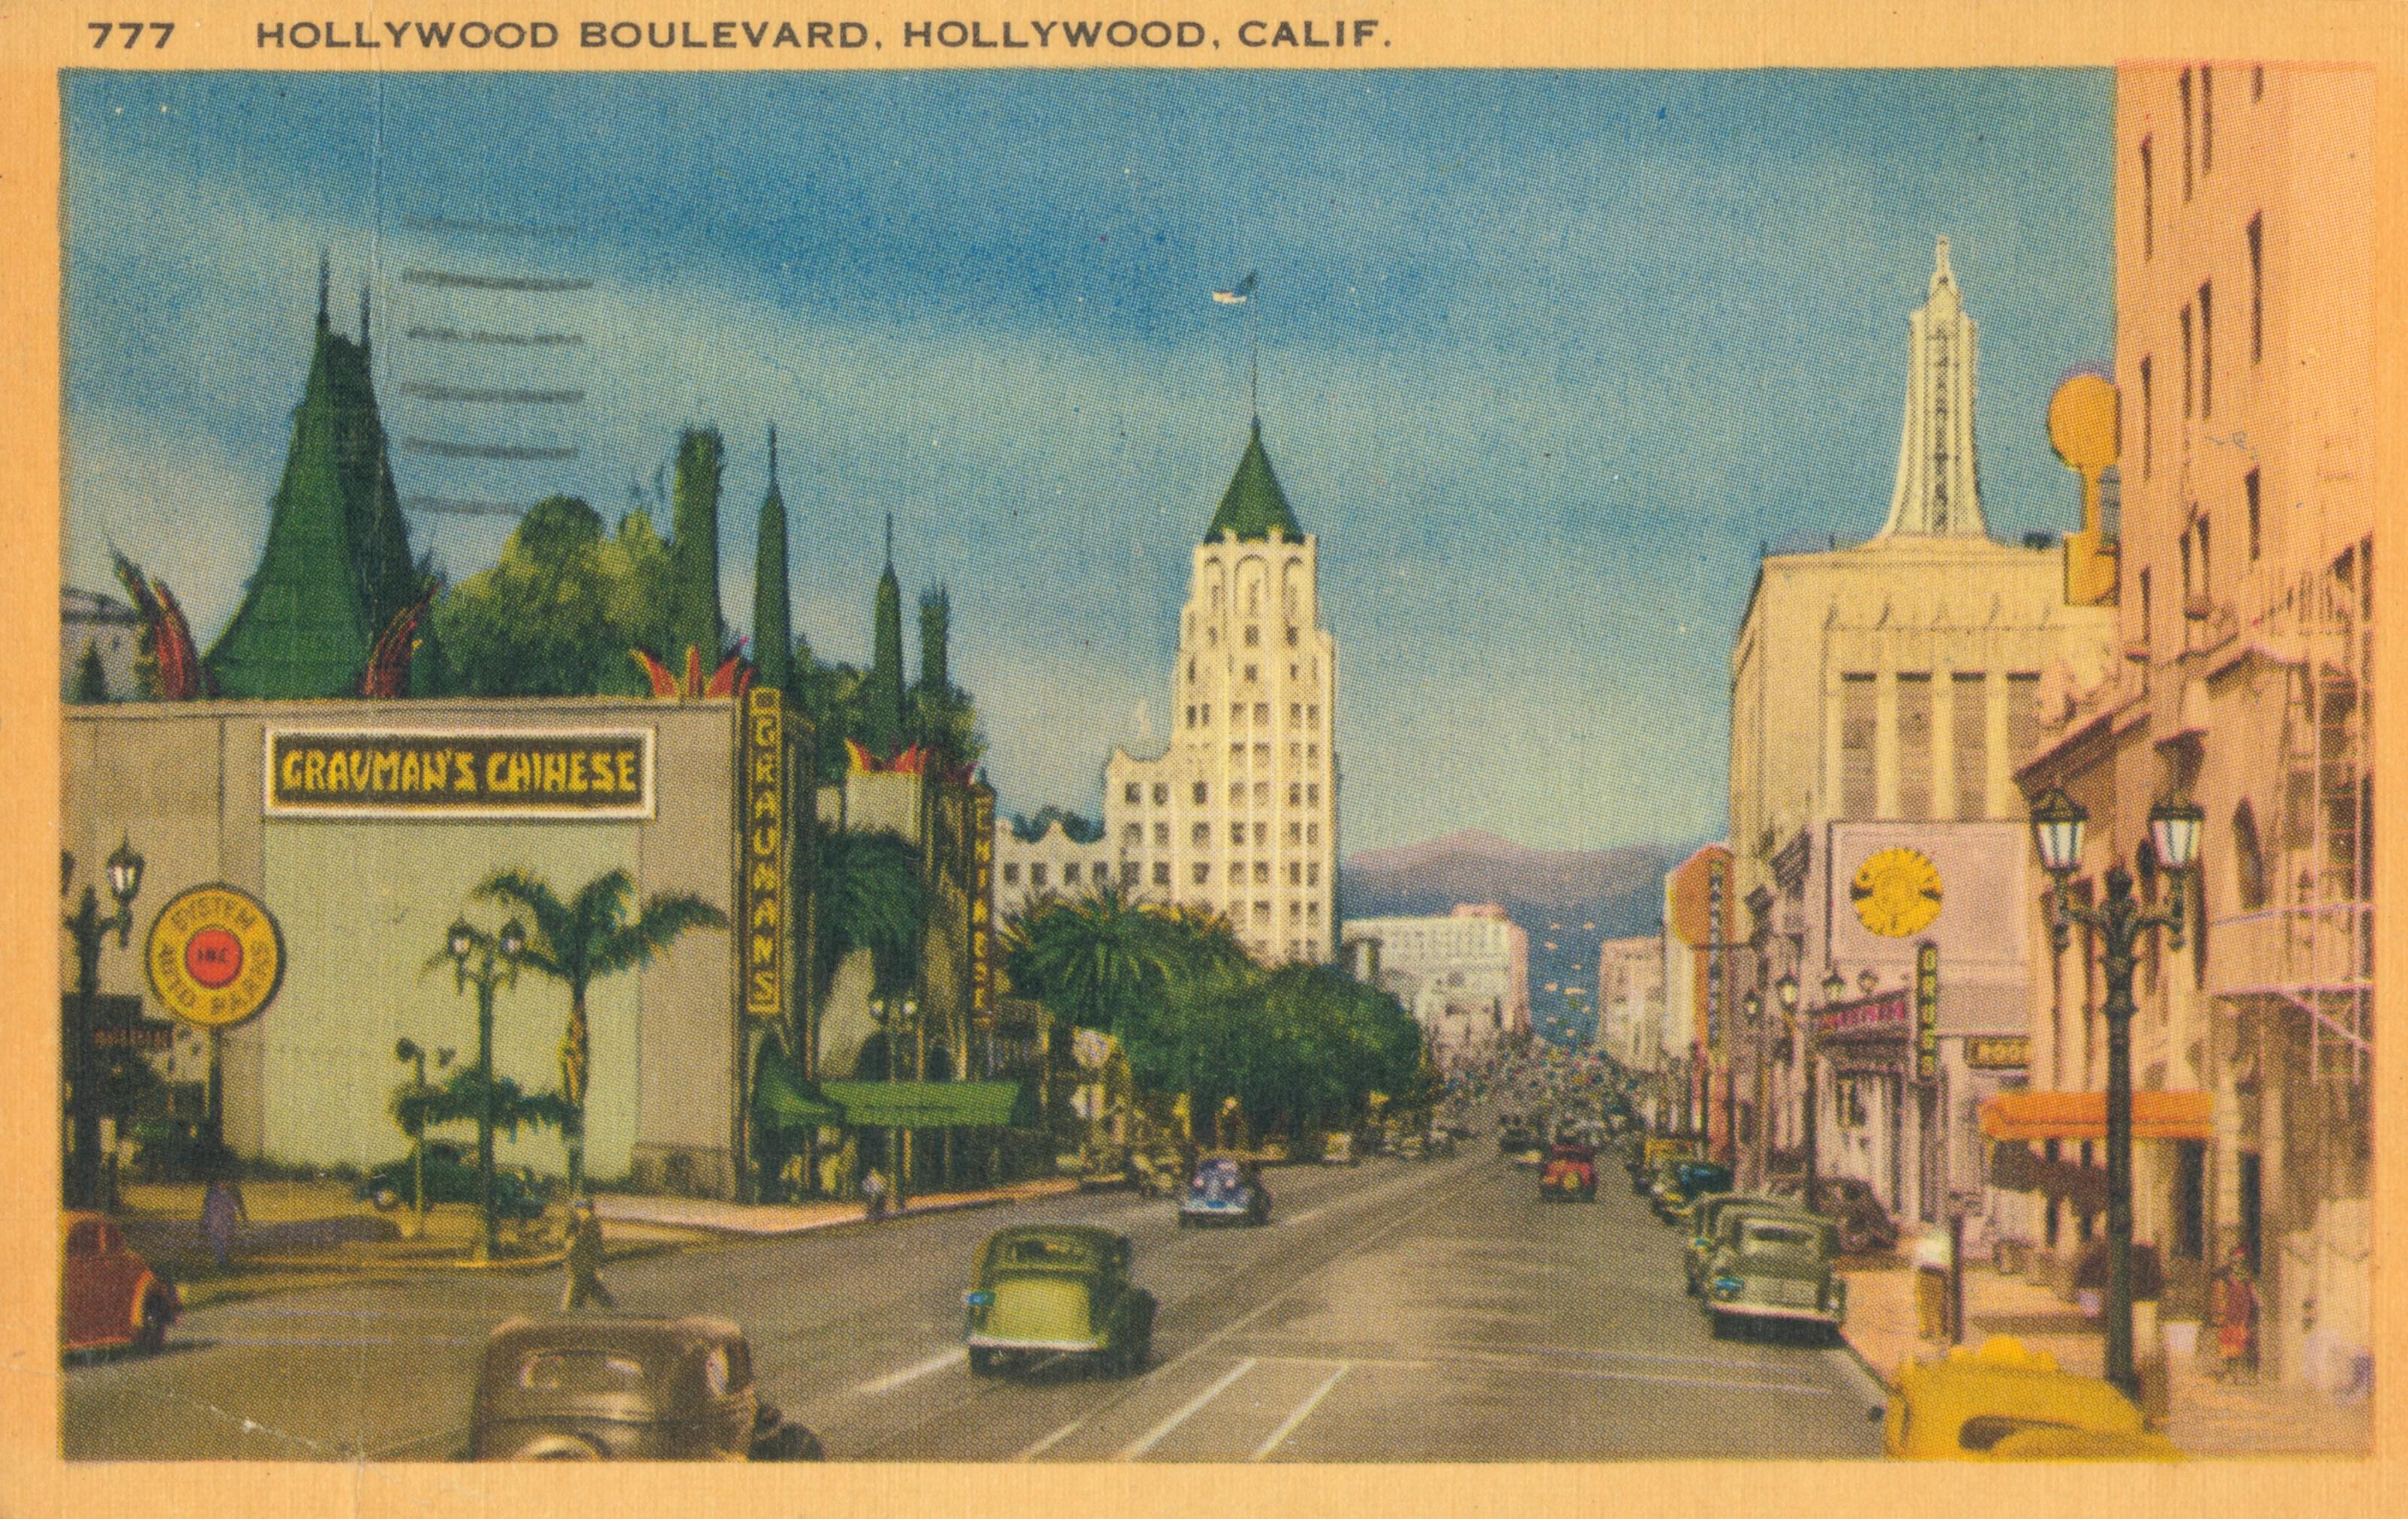 Colorized postcard of Hollywood Boulevard, California.